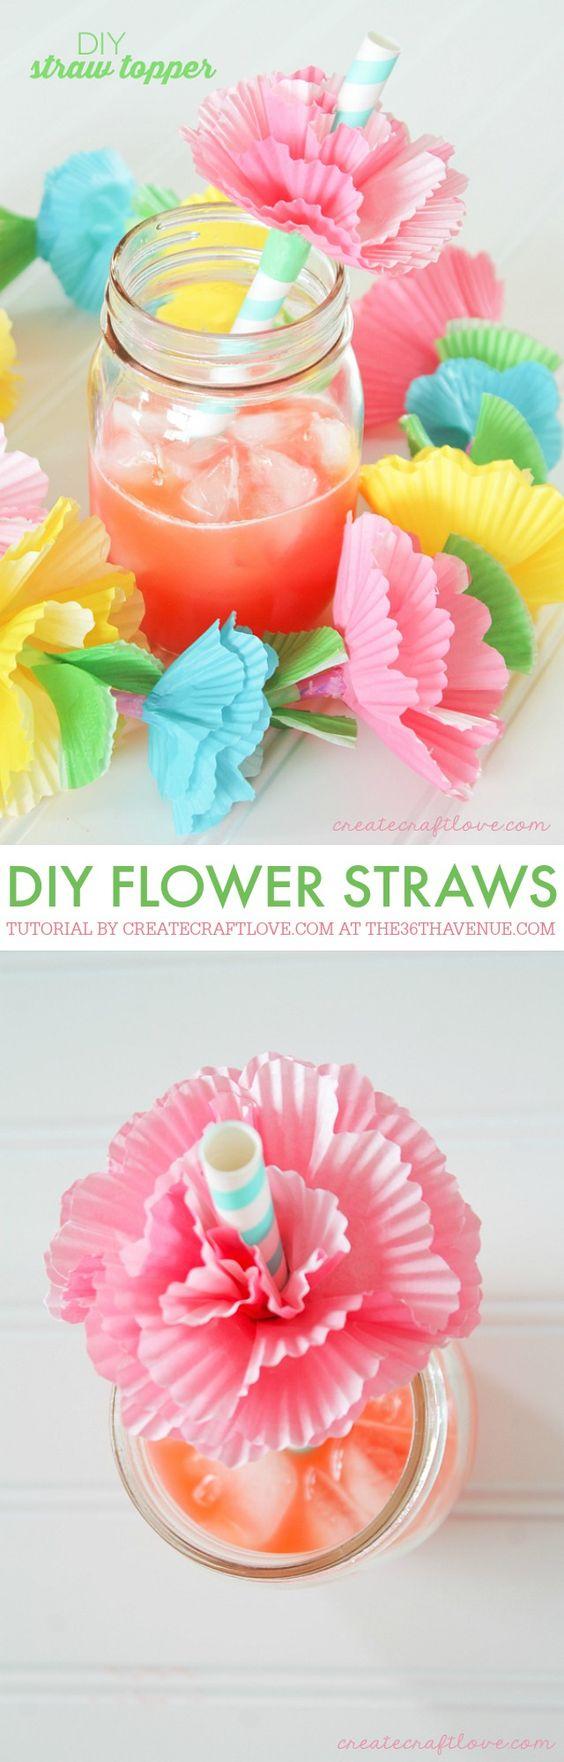 DIY Crafts - Add flare to your next summer gathering with these easy to make DIY Straw Toppers! // Blumen Topper für Strohhalme aus Muffinförmchen